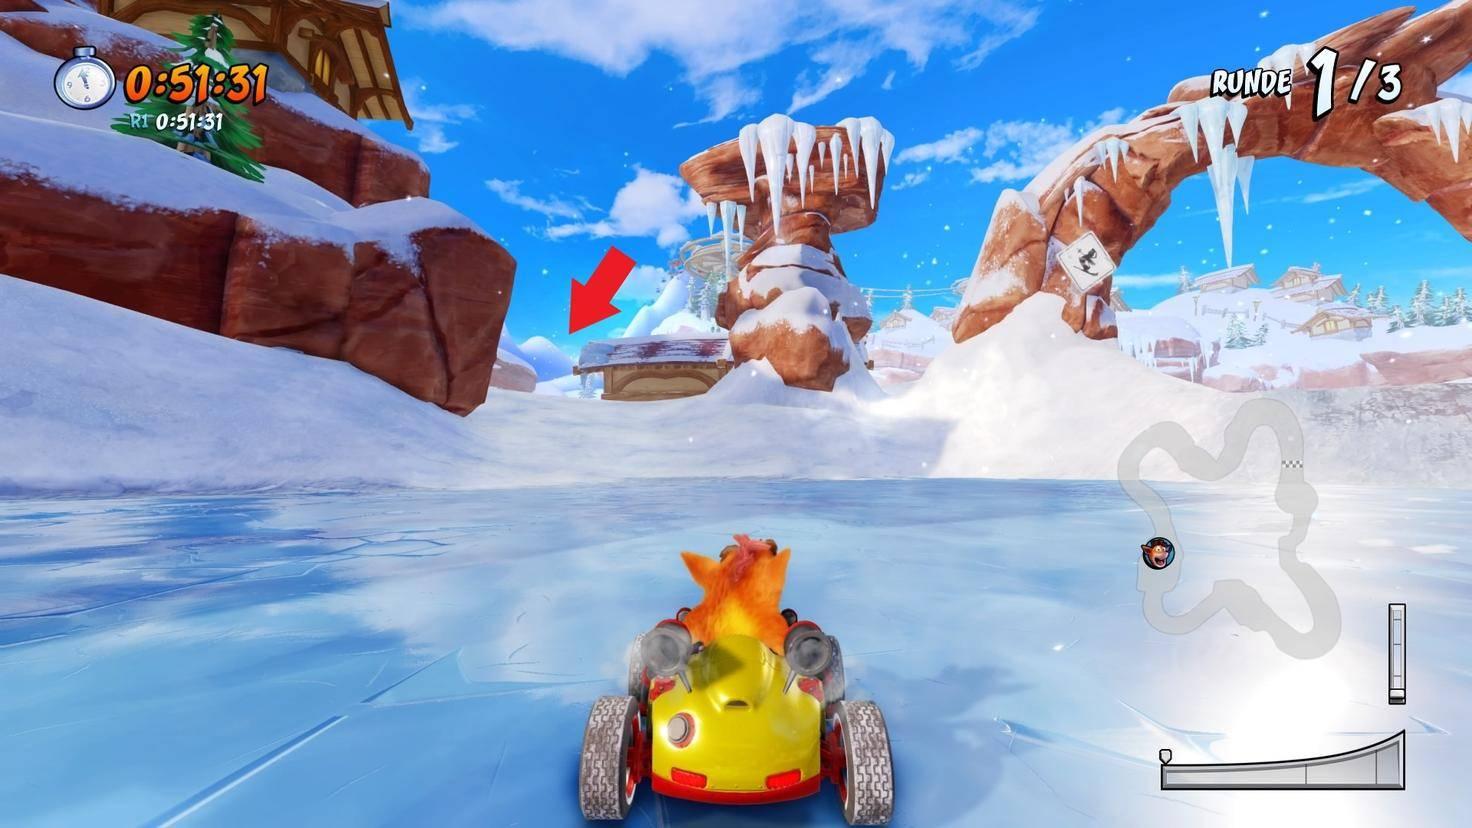 Crash-Team-Racing-Nitro-Fueled-Abkürzung-Blizzard-Bluff-2